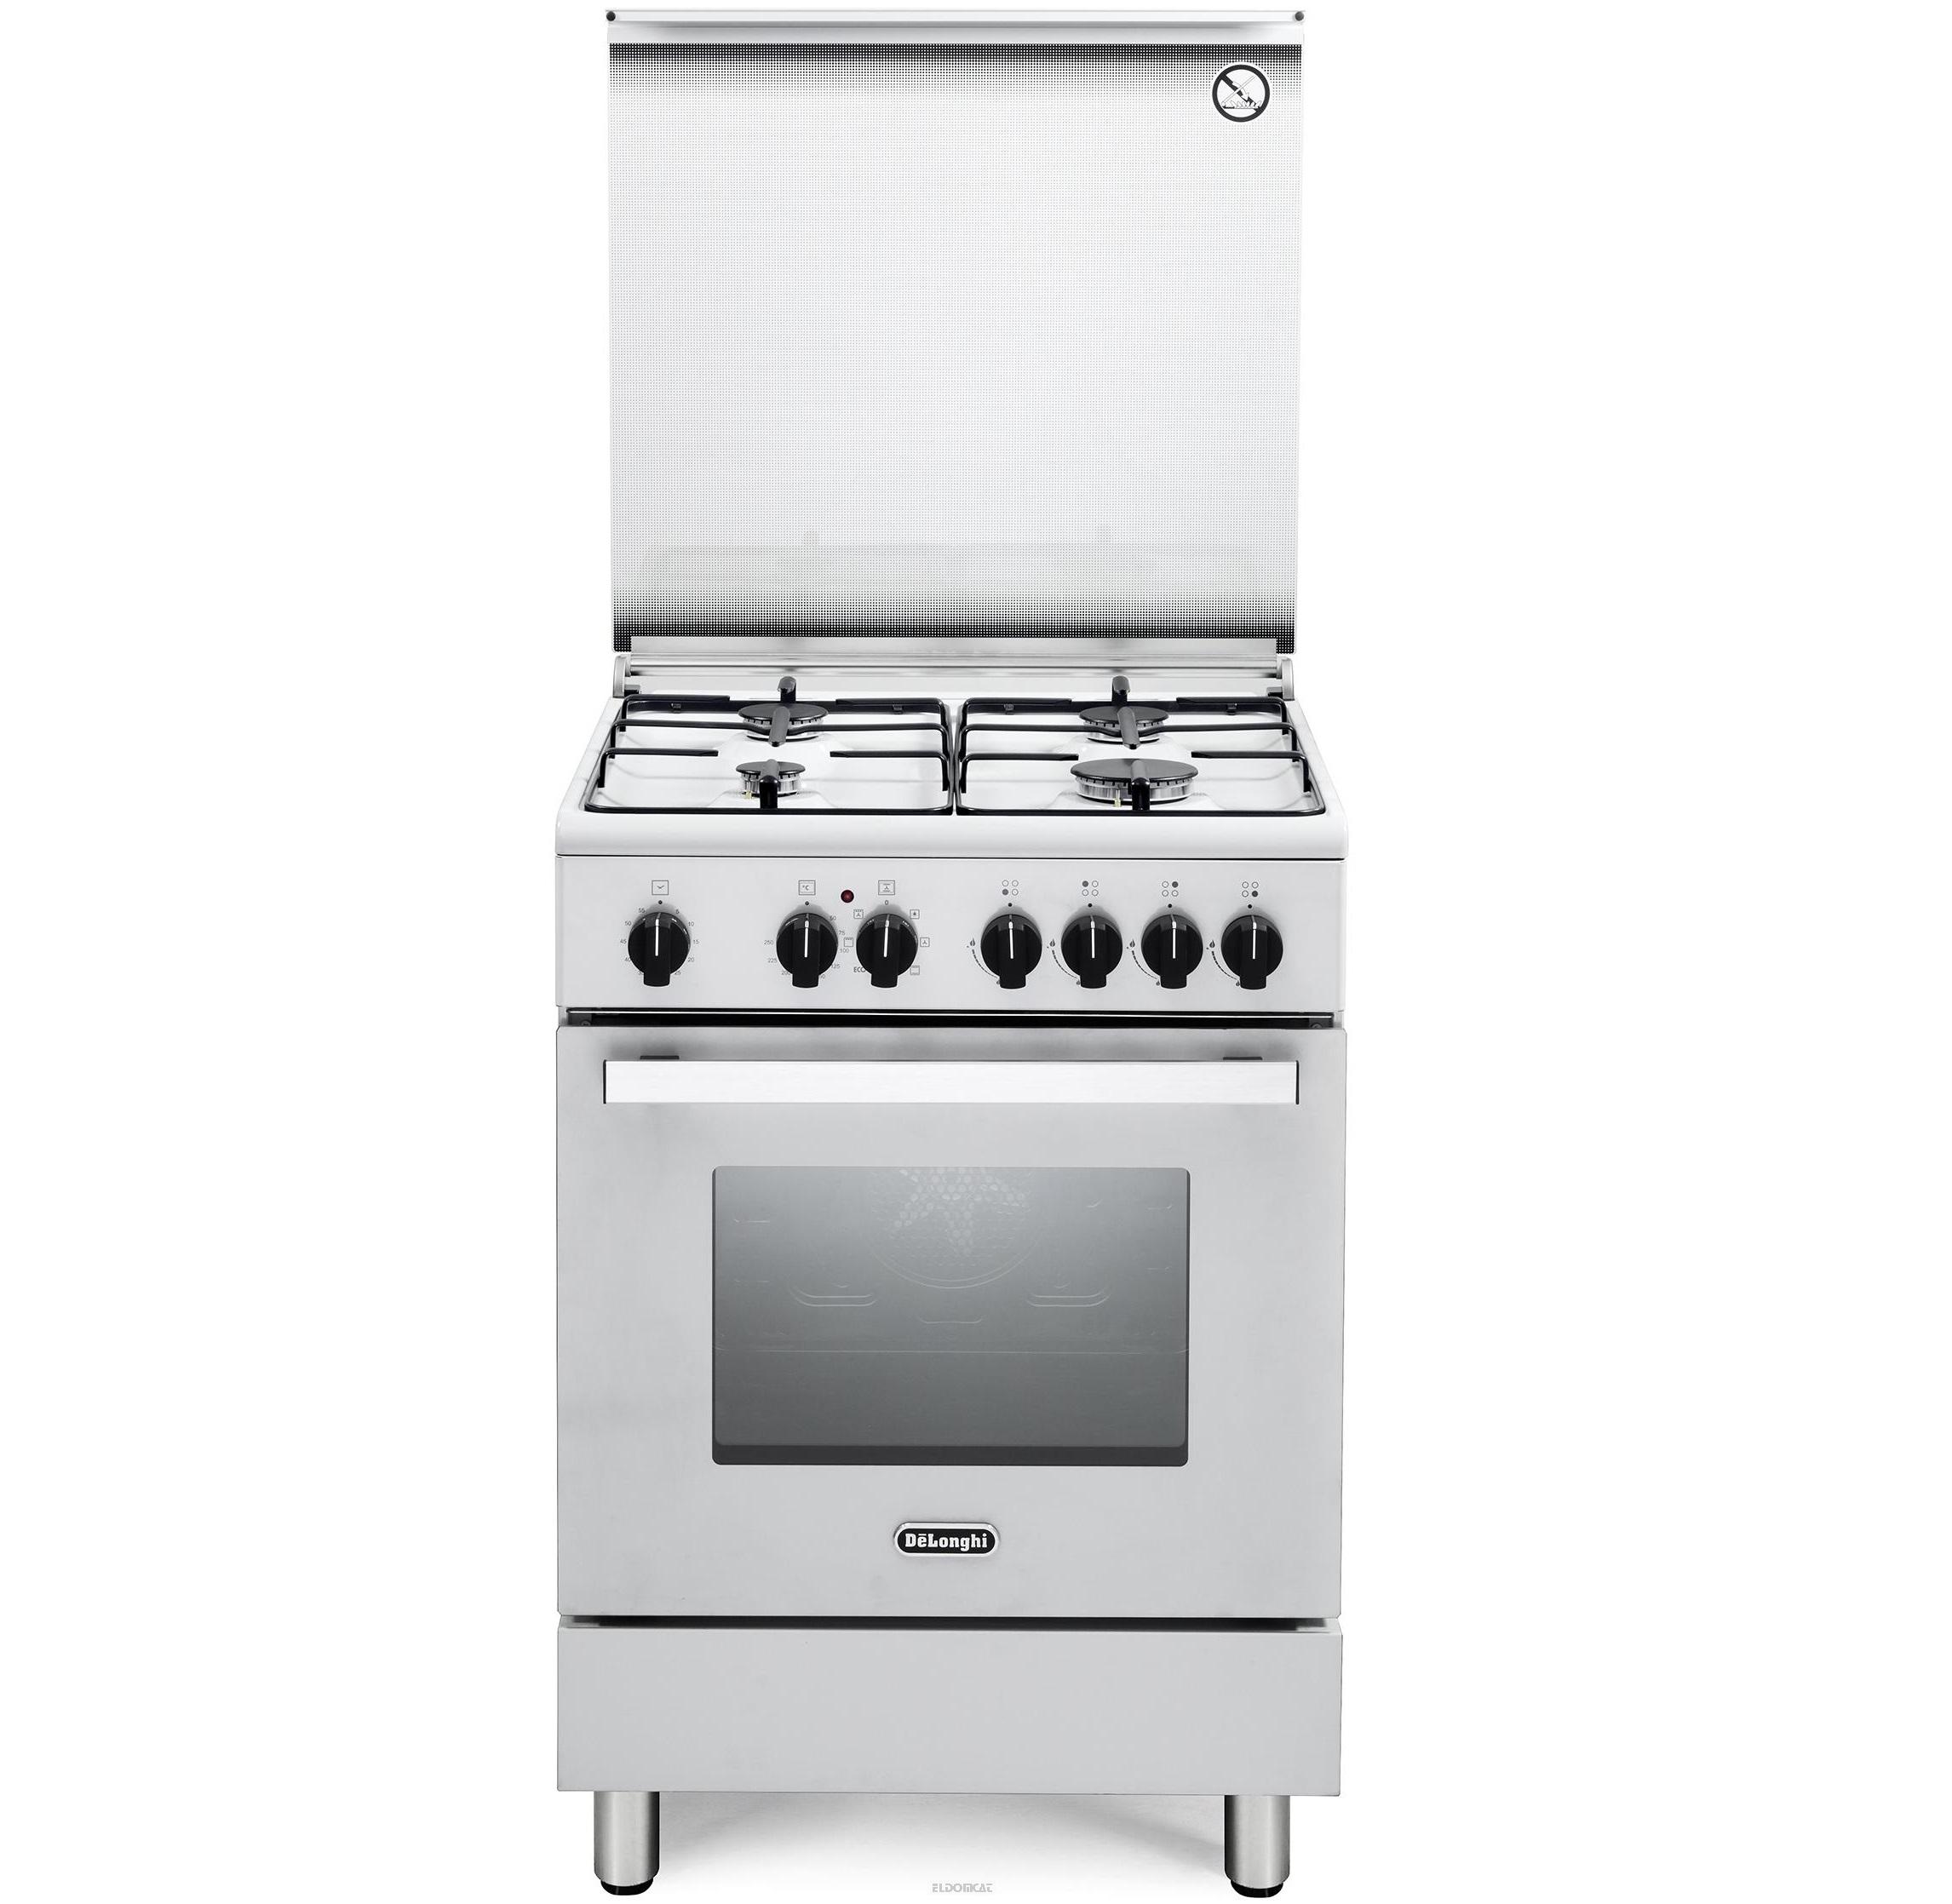 Delonghi  Cooker DMW64ED